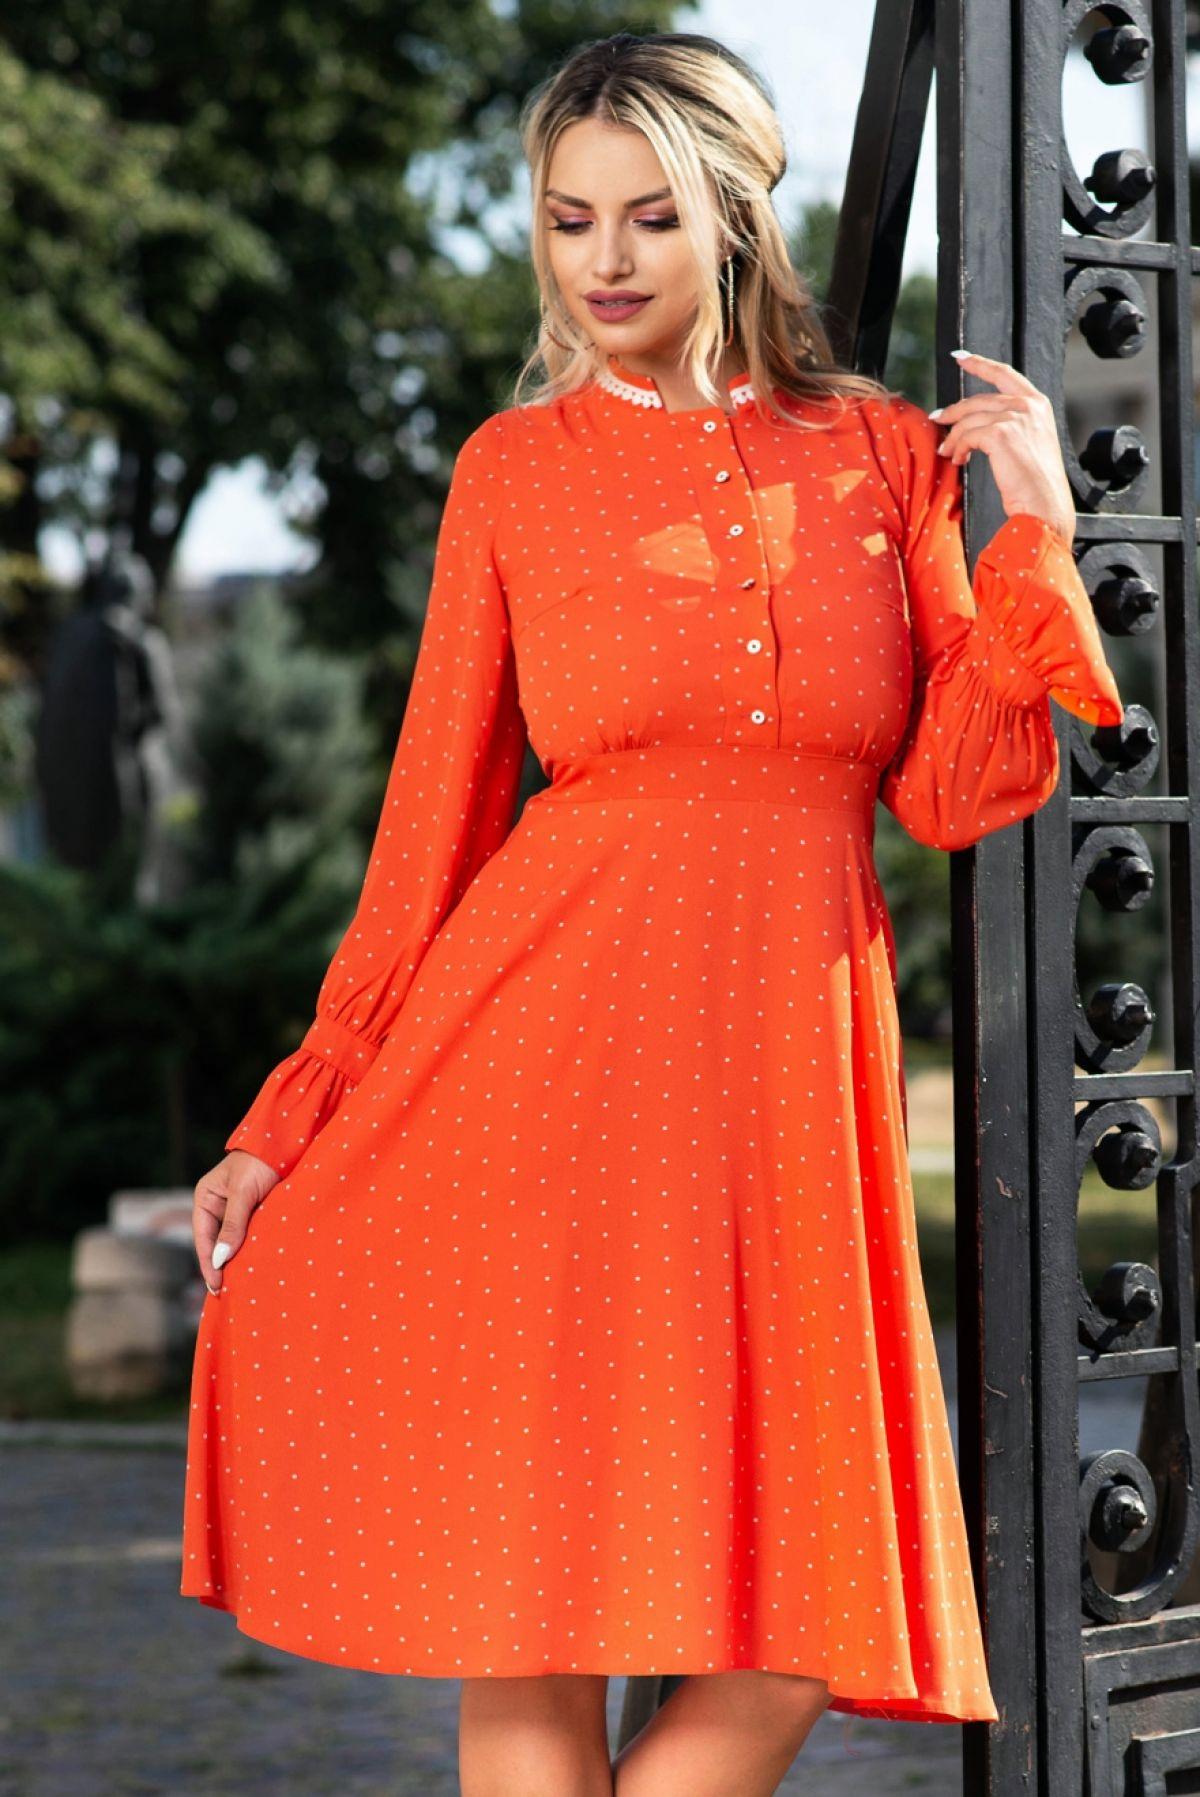 Rochie portocalie cu buline Moze Moze